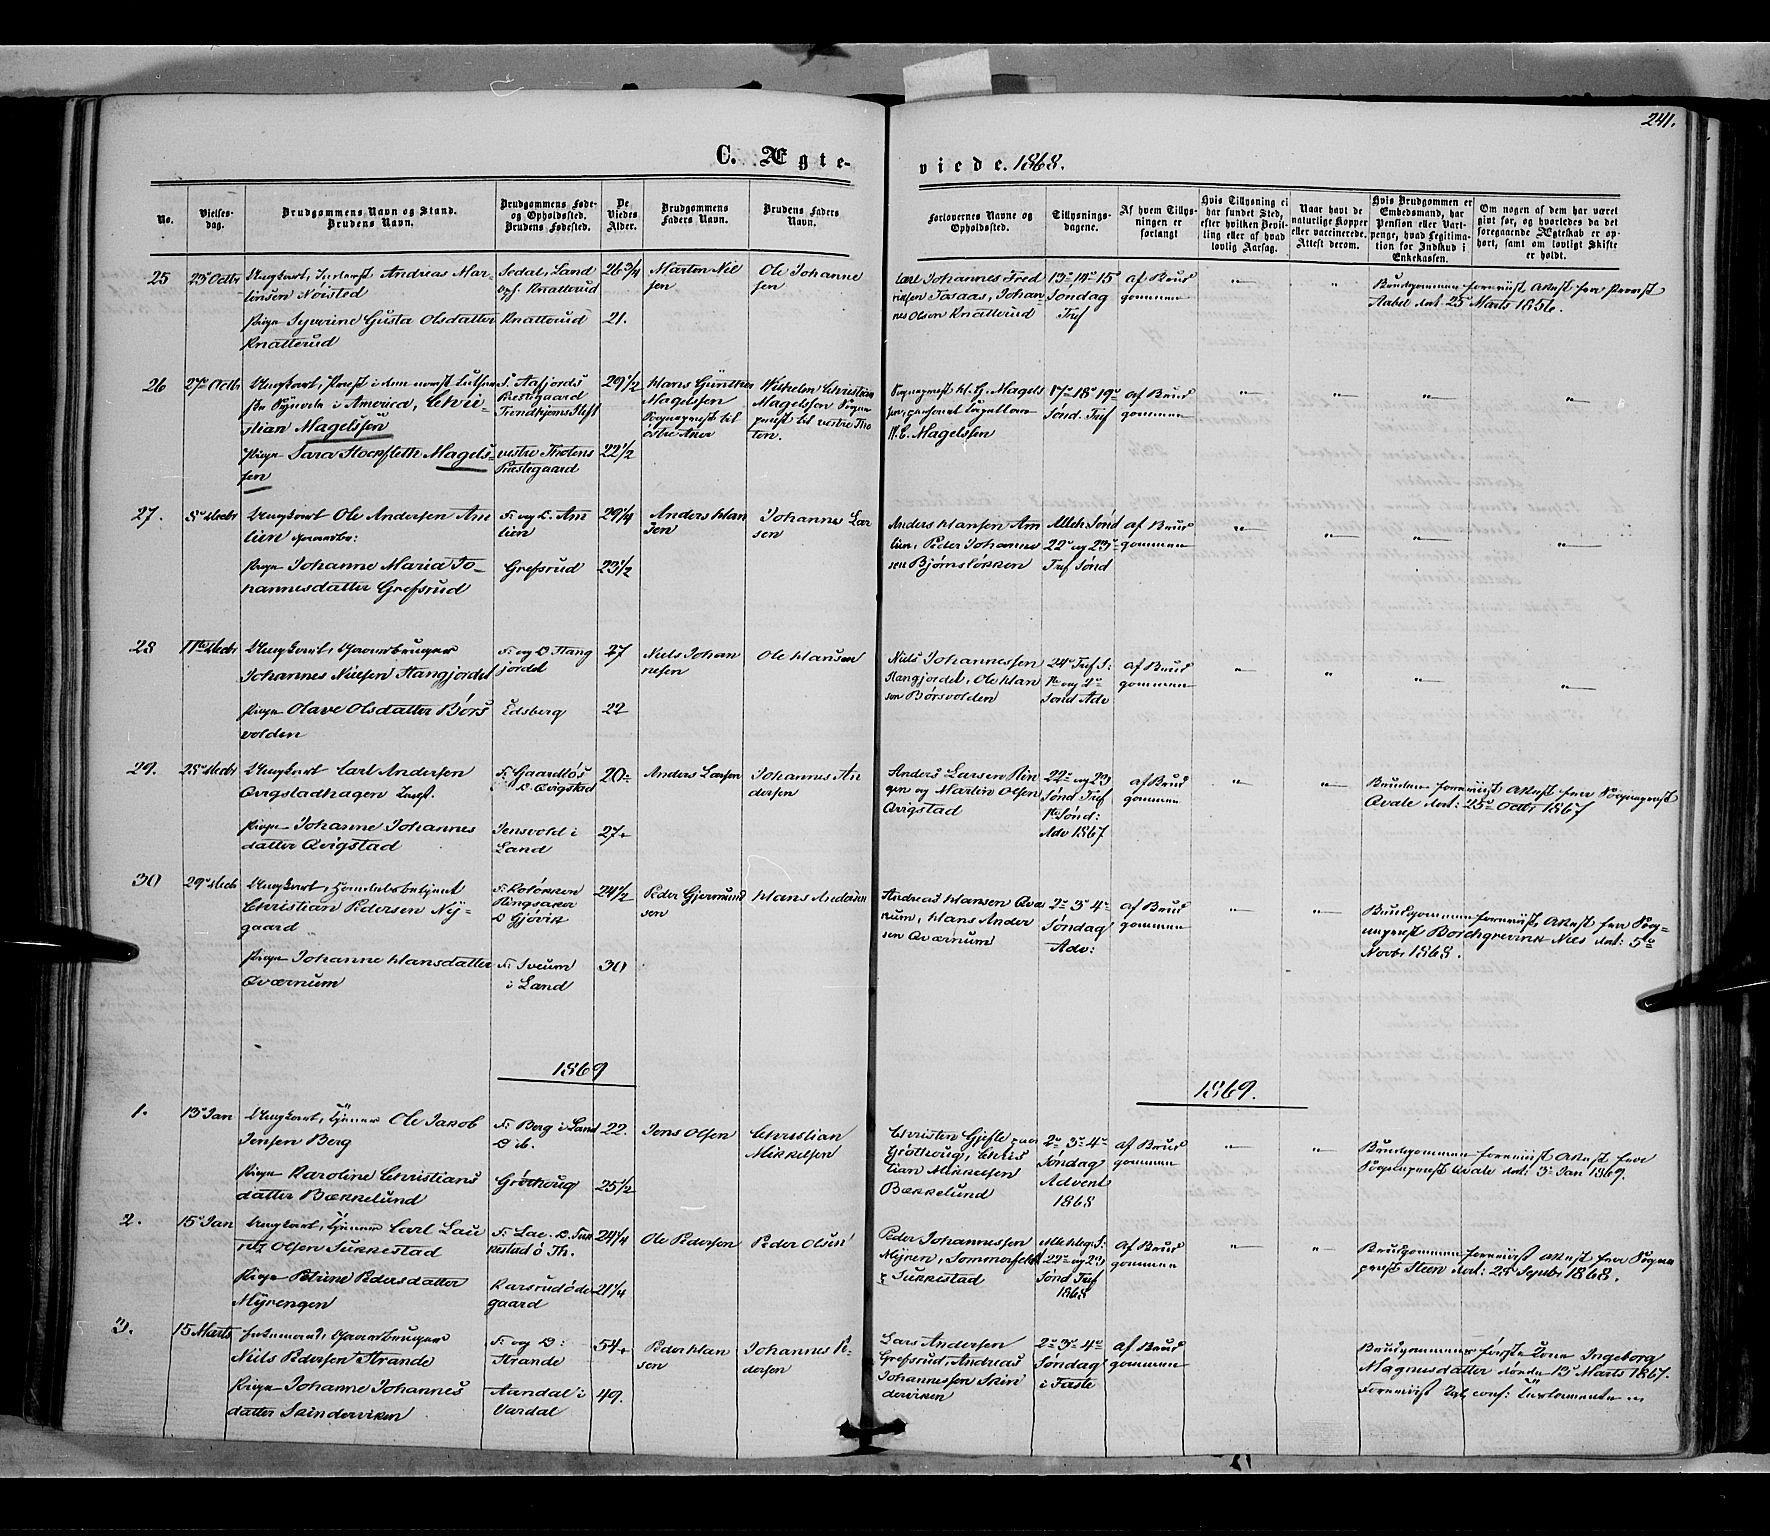 SAH, Vestre Toten prestekontor, H/Ha/Haa/L0007: Ministerialbok nr. 7, 1862-1869, s. 241